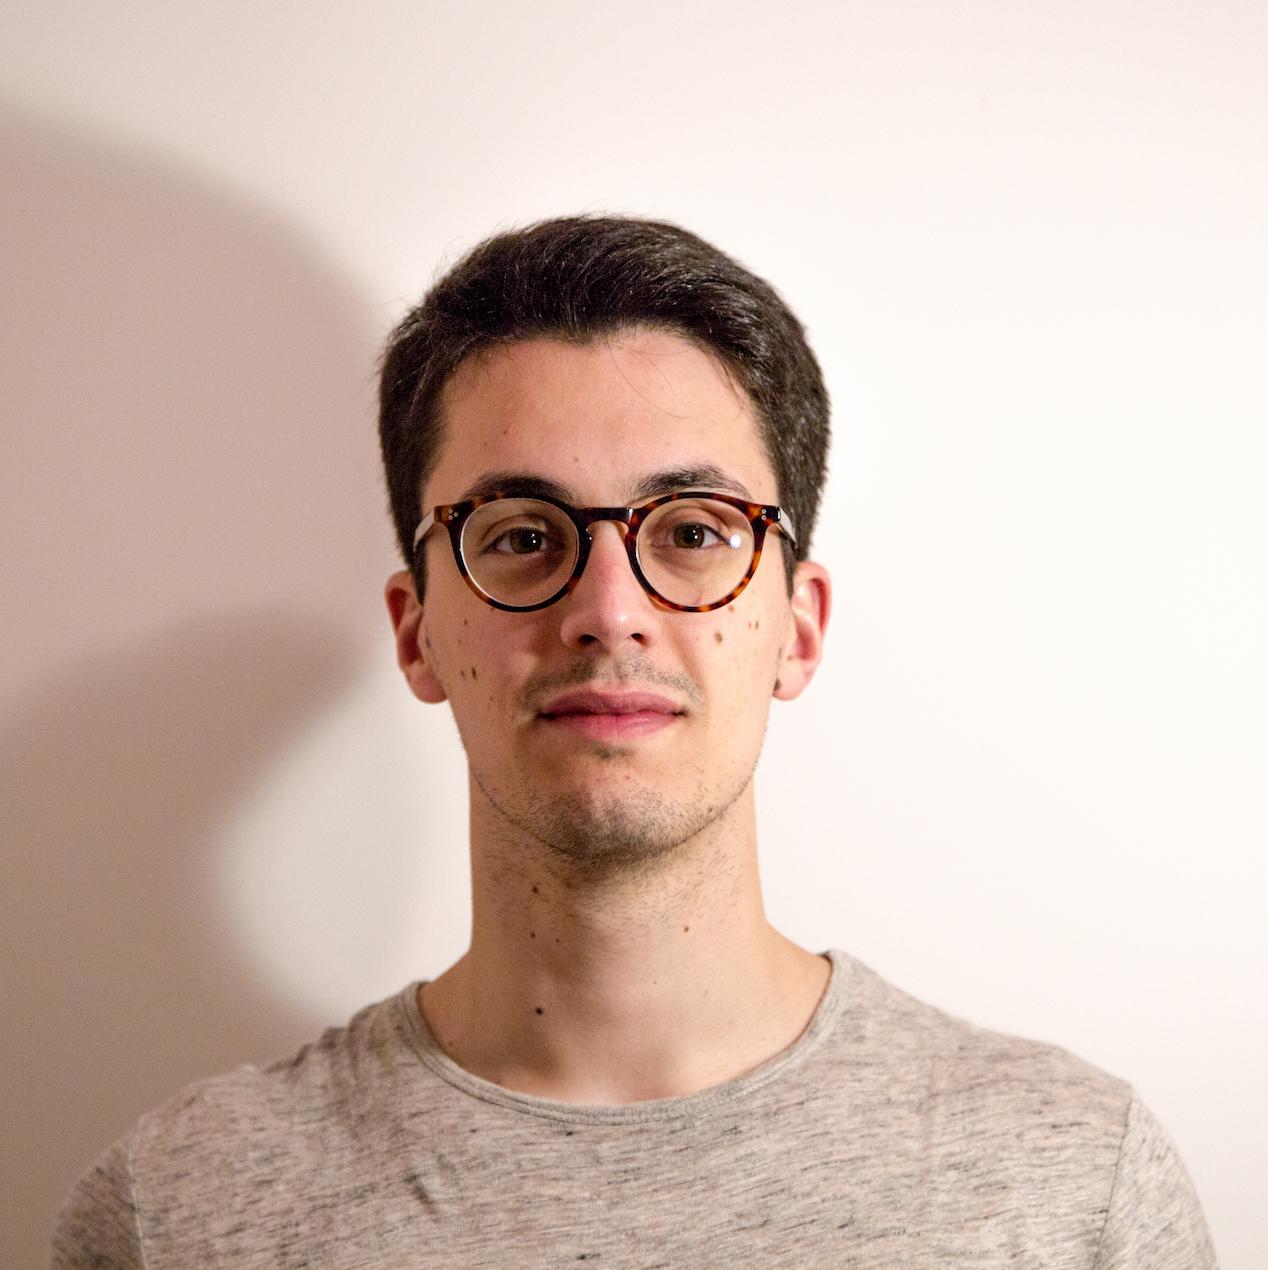 Gianluca Mauro